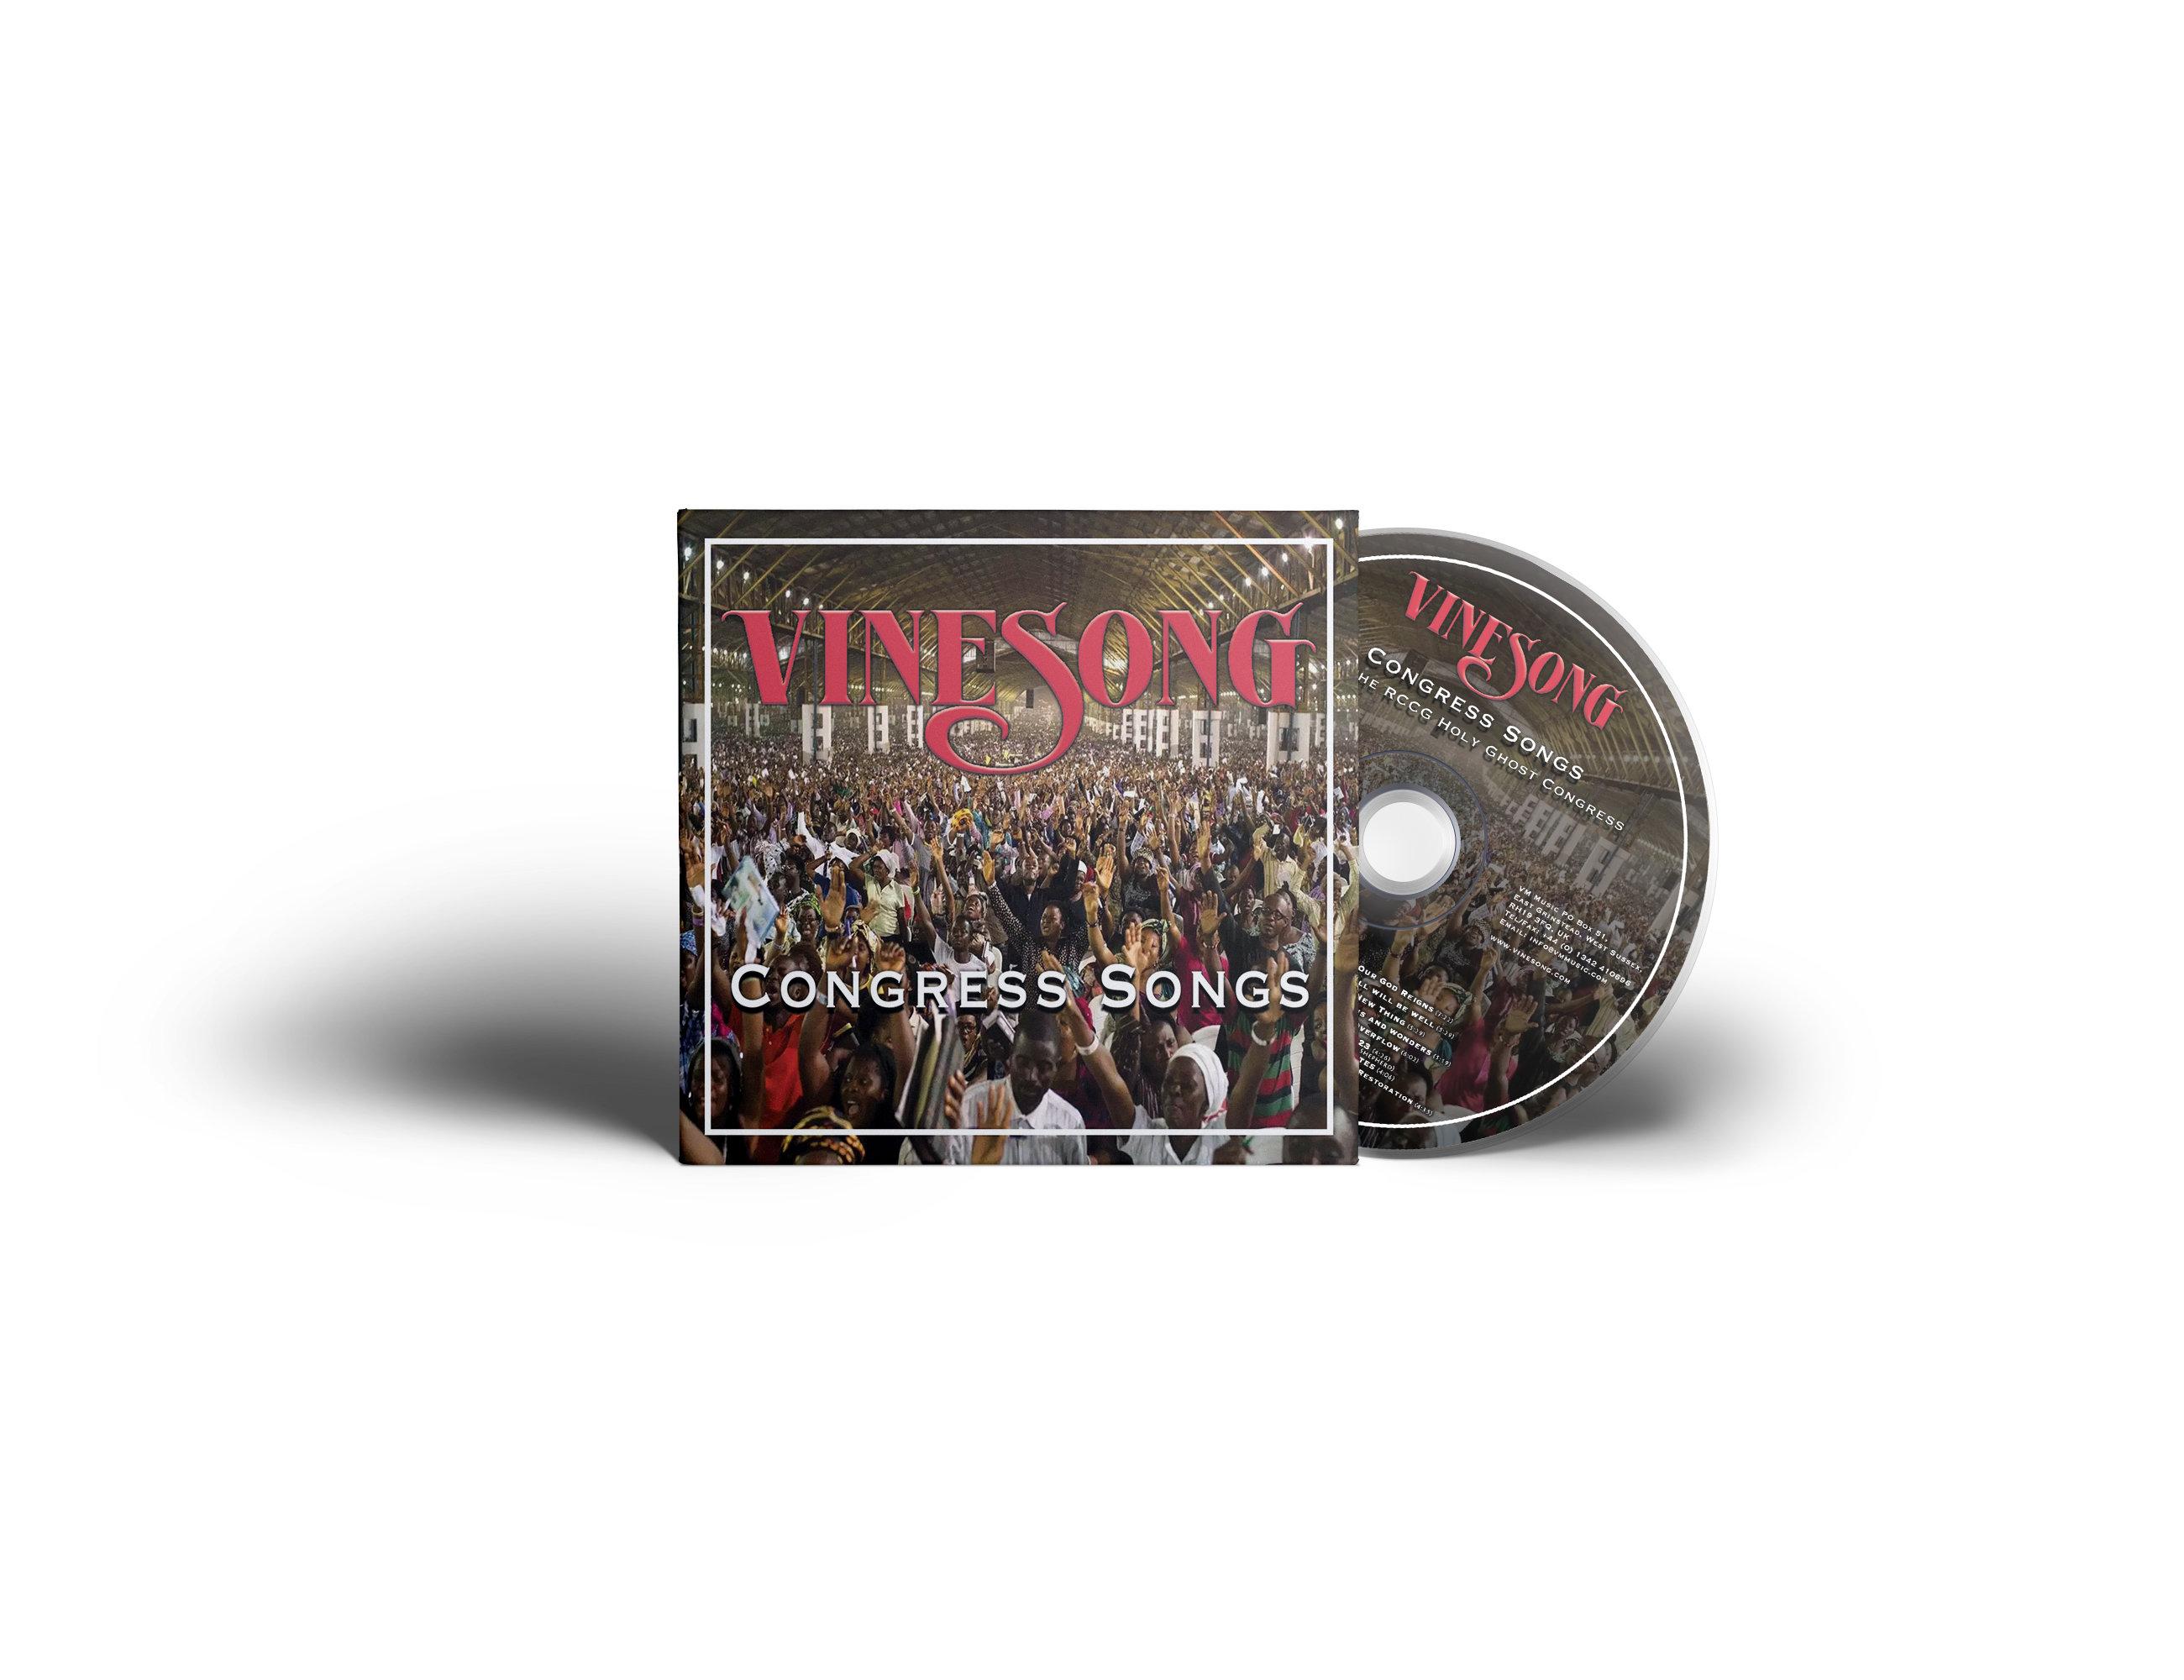 New Album: Congress Songs 11189